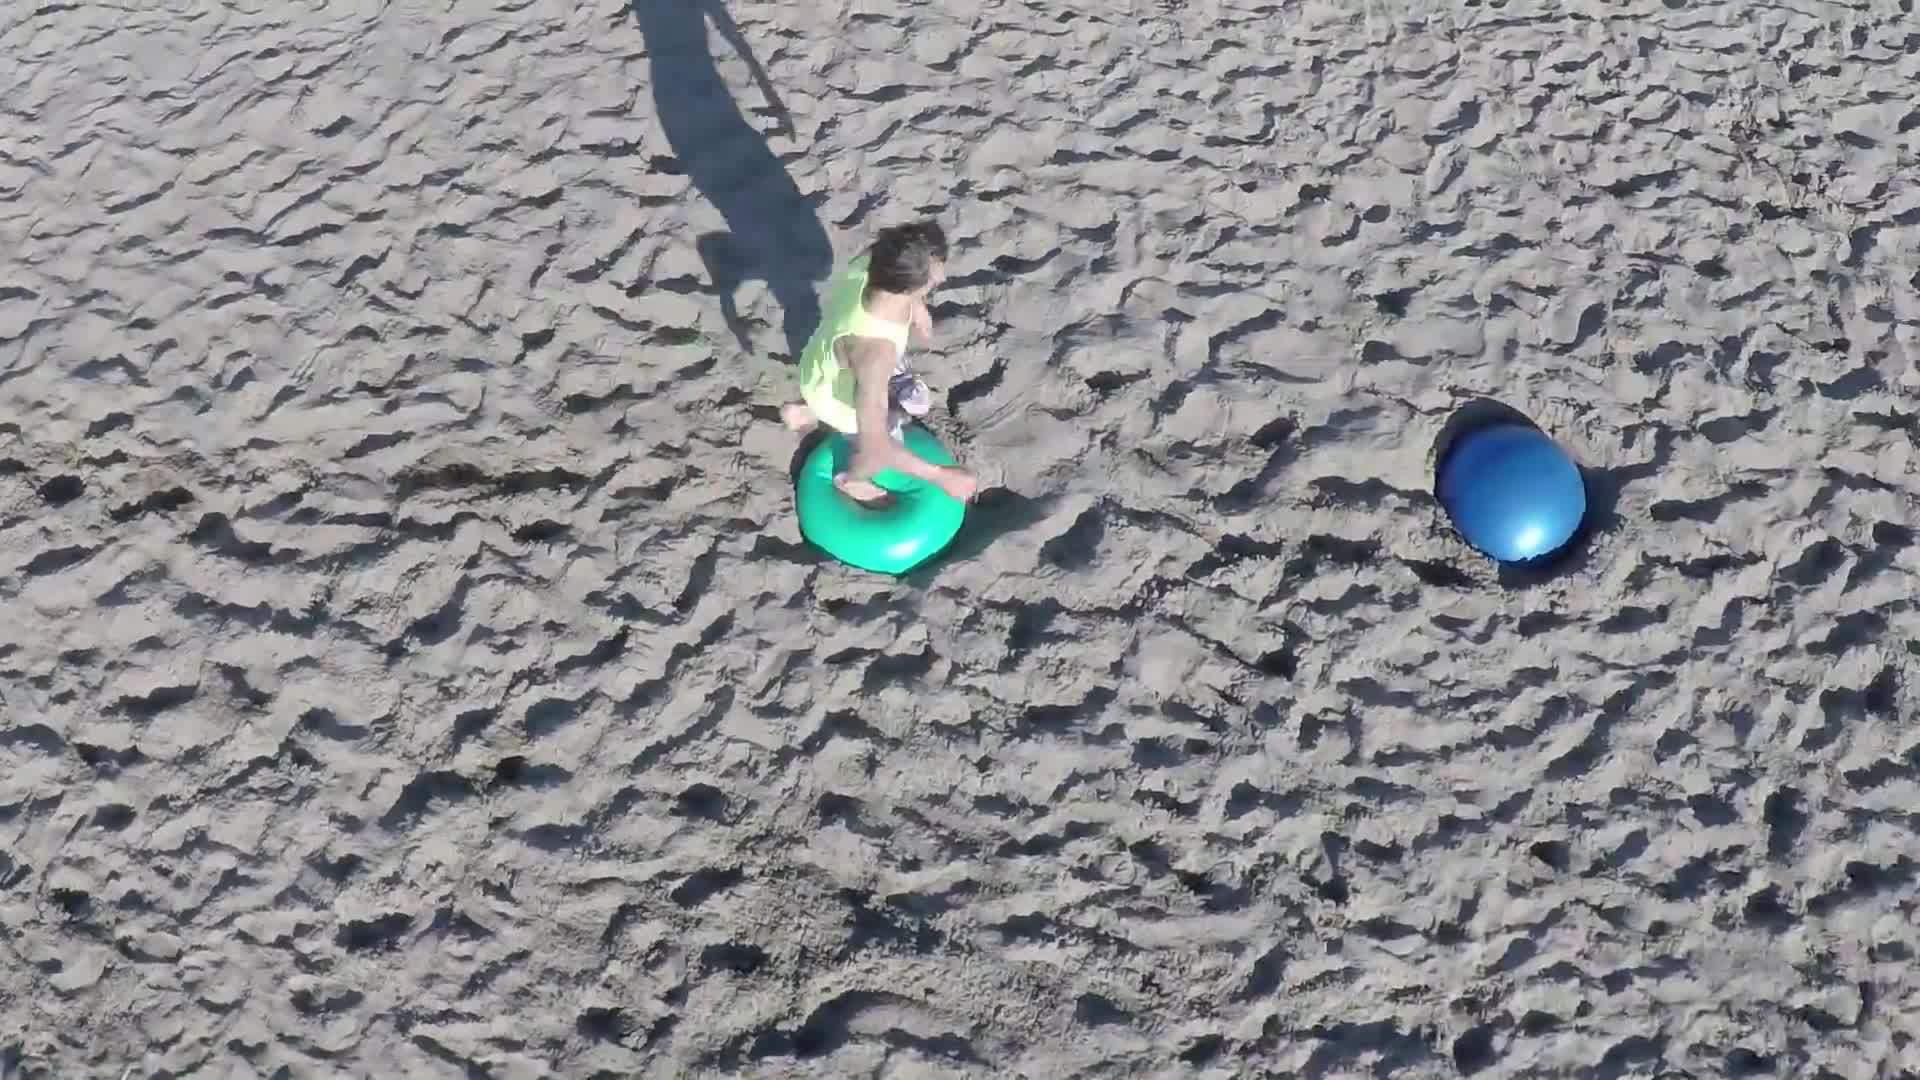 free, freerunning, running, Yoga Ball Tricking on a Beach / Freerunning / Acrobatics GIFs